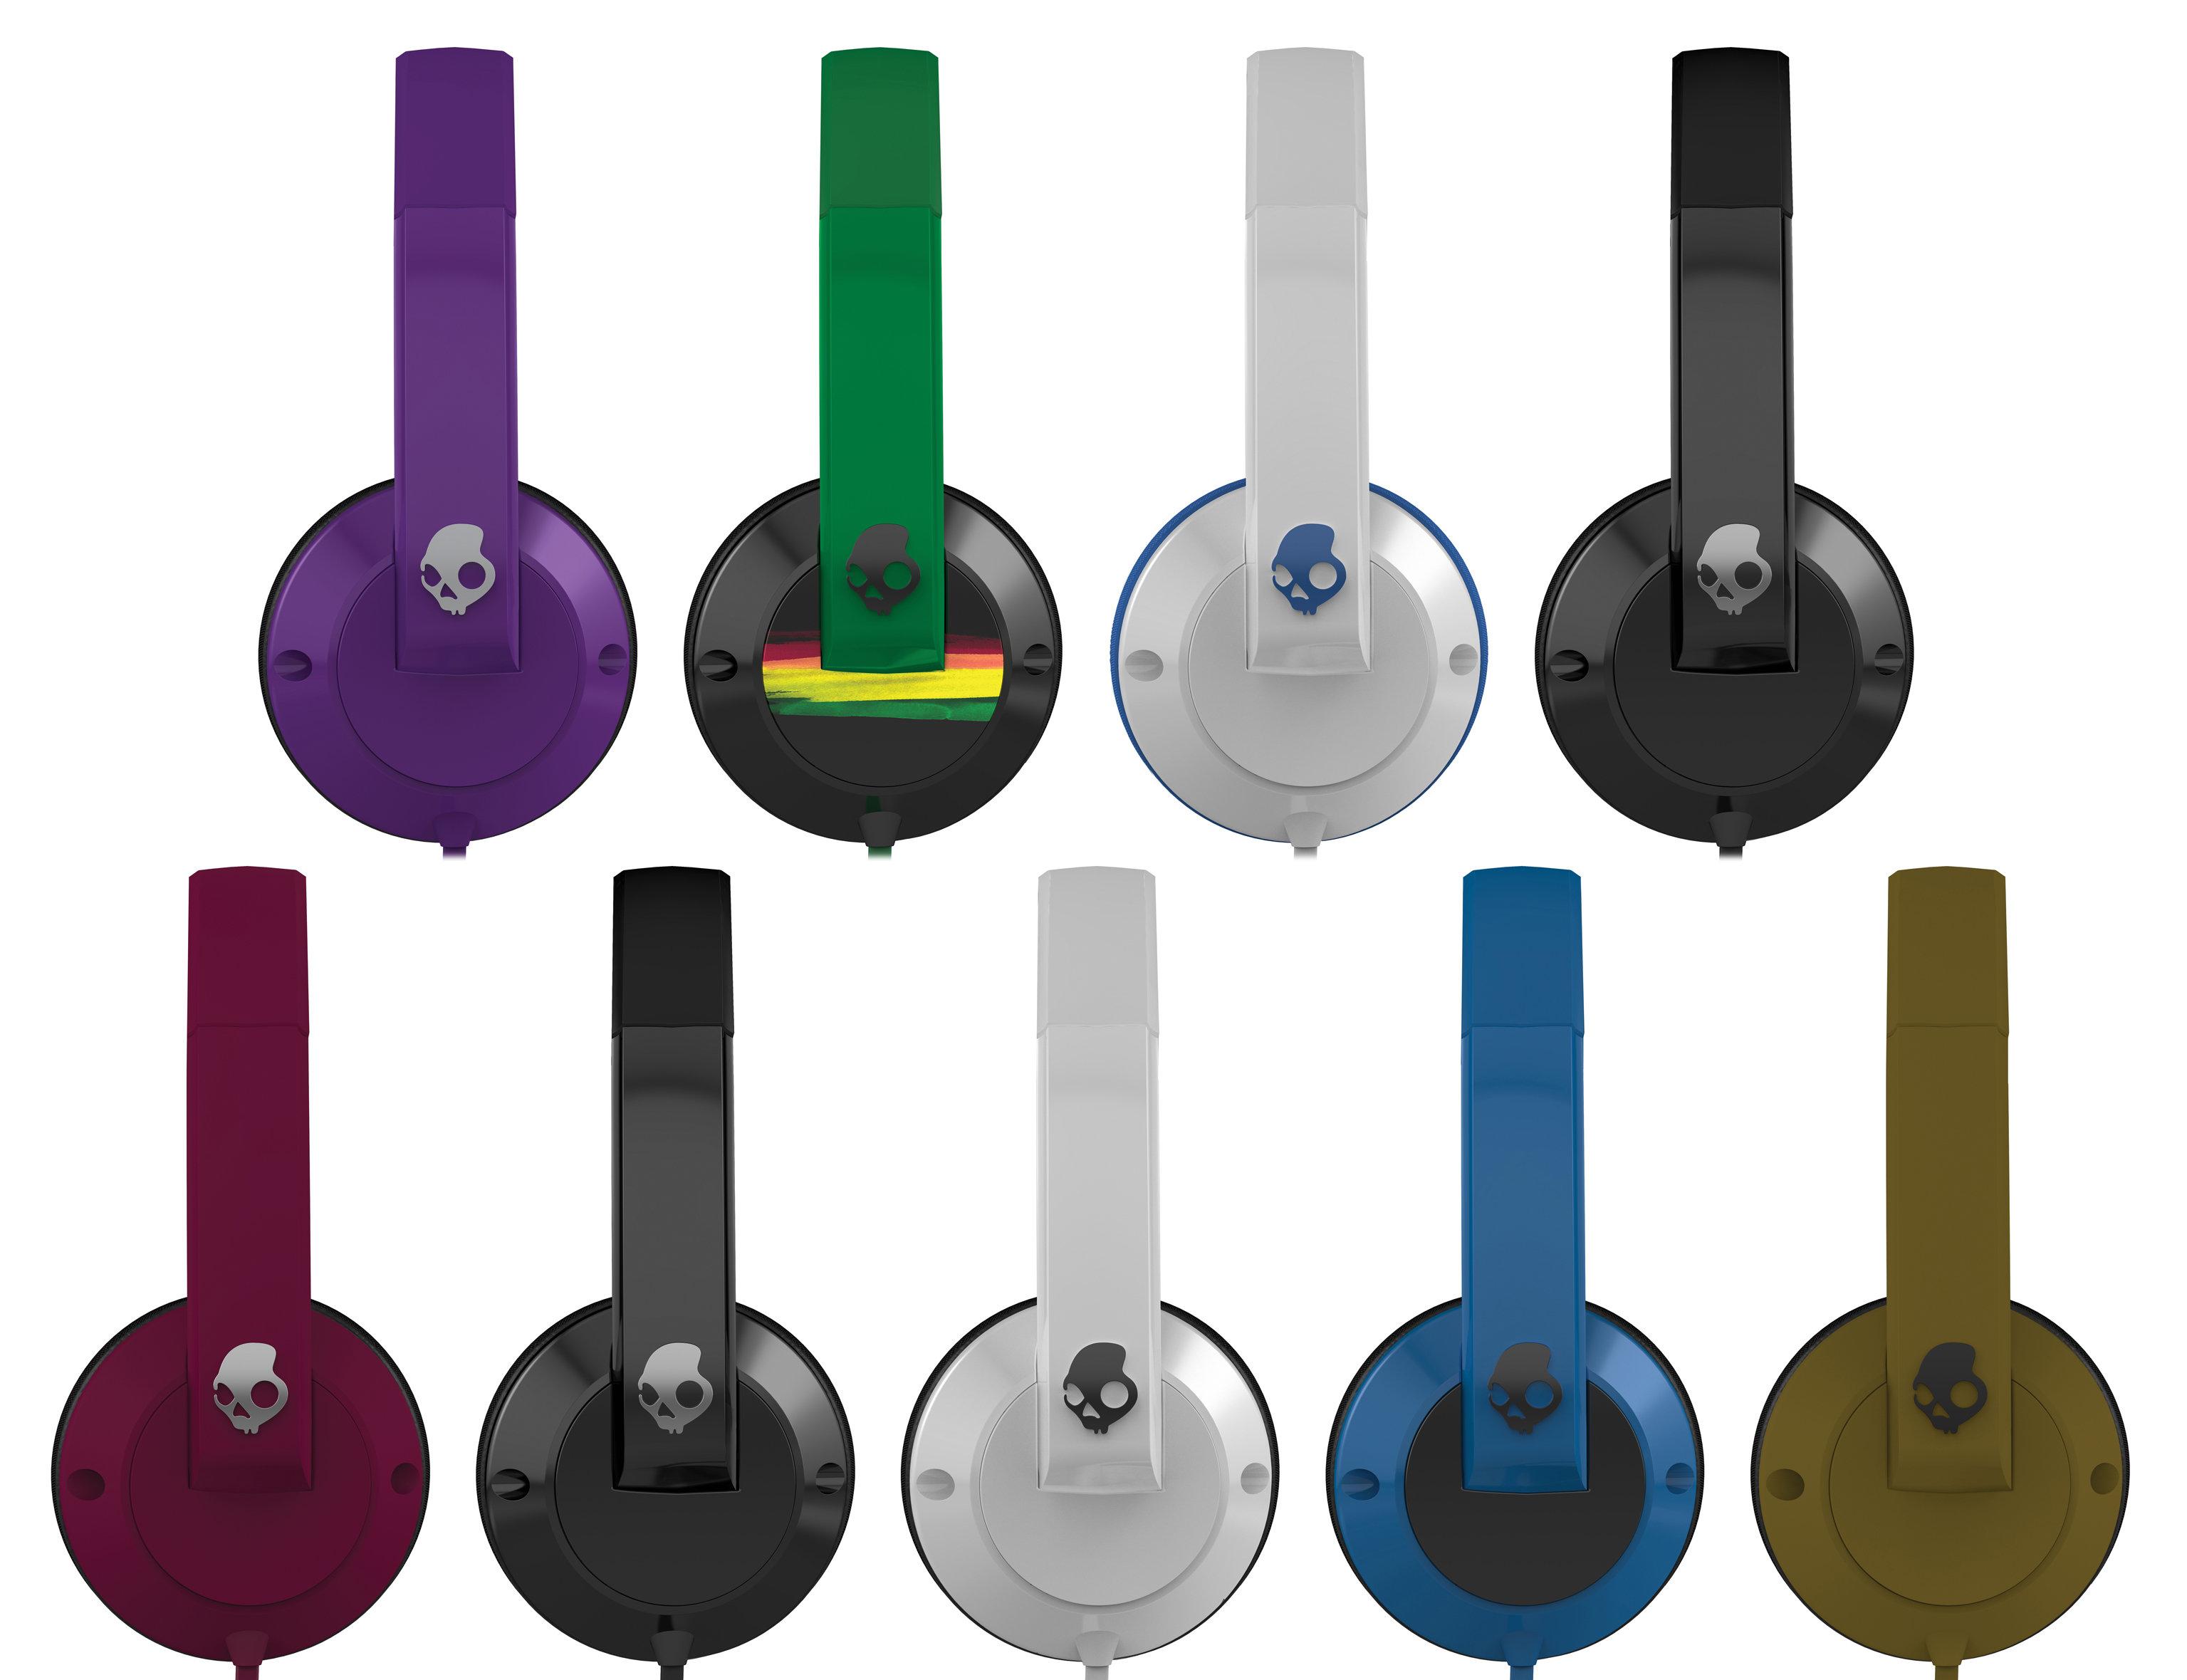 Skullcandy Uprock 2 0 On Ear Headphones Black Black Amazon co uk Electronics